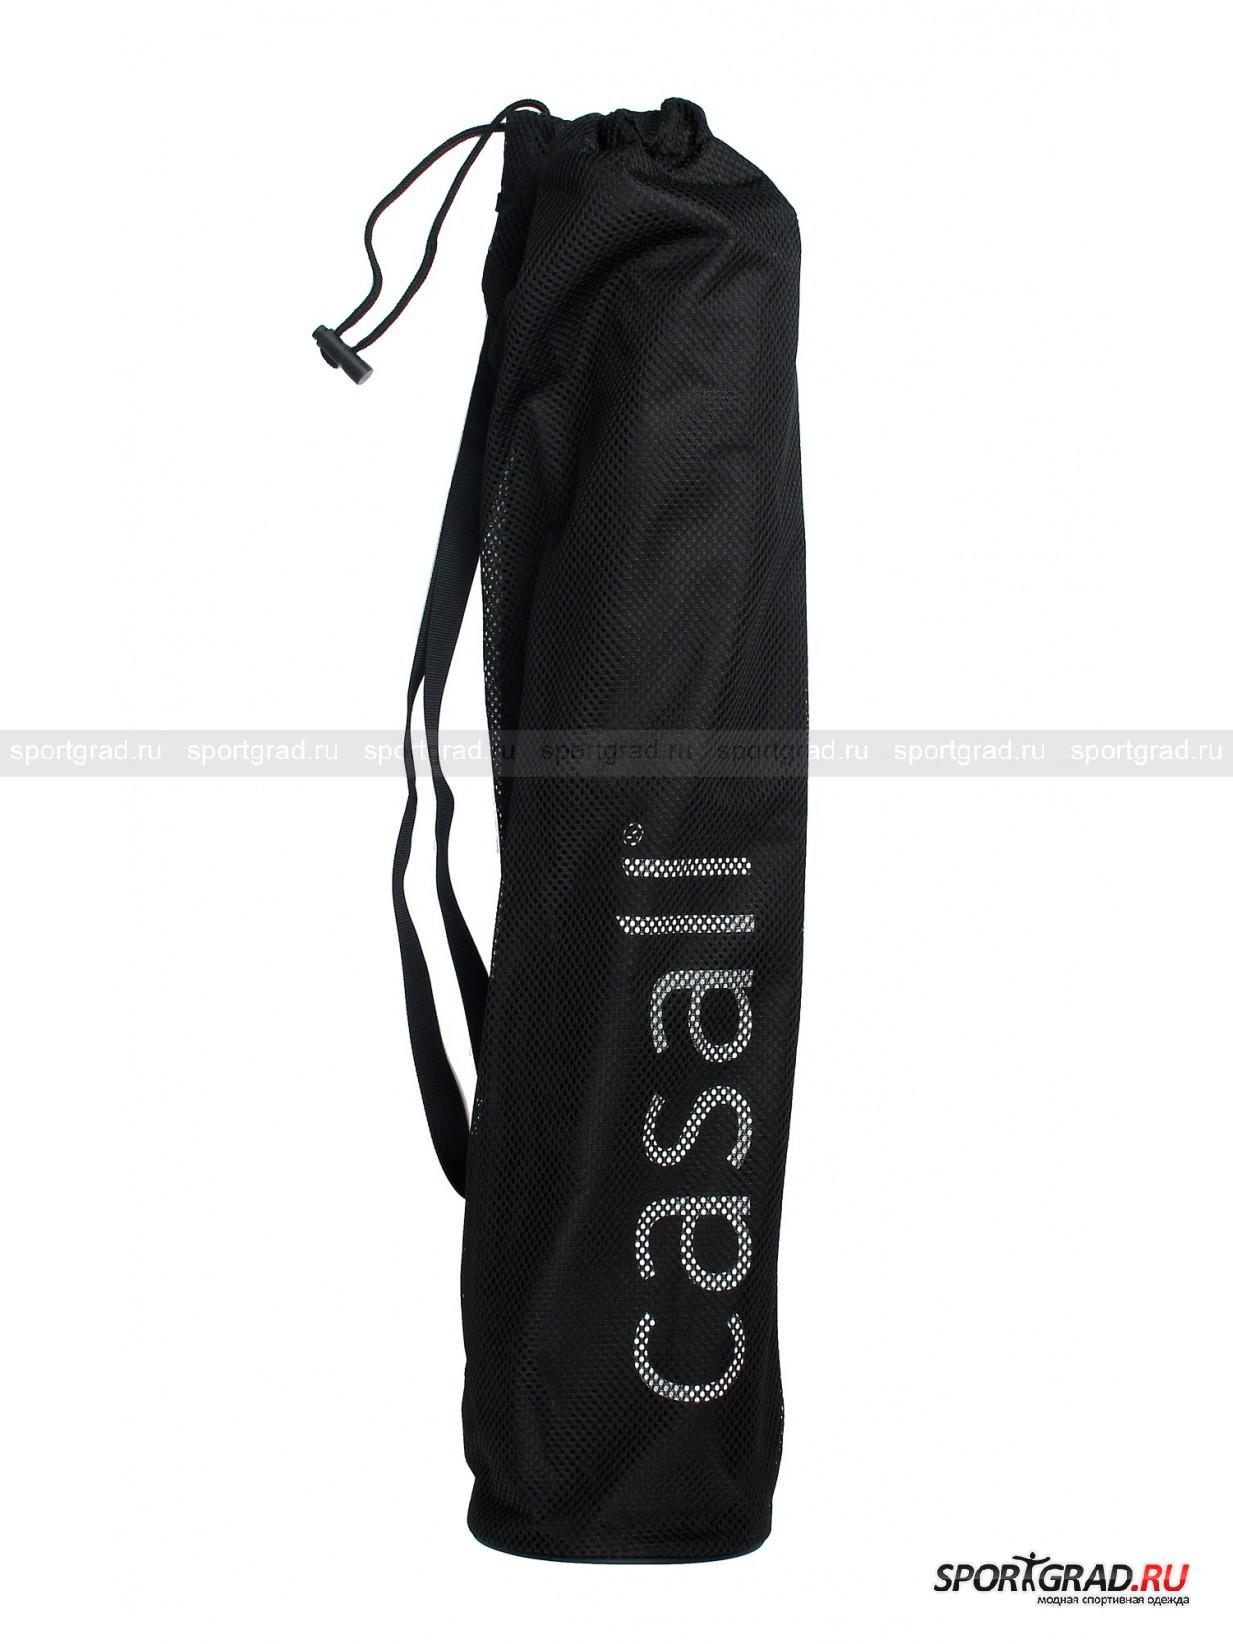 Сумка для коврика Yoga mat bag CASALL от Спортград